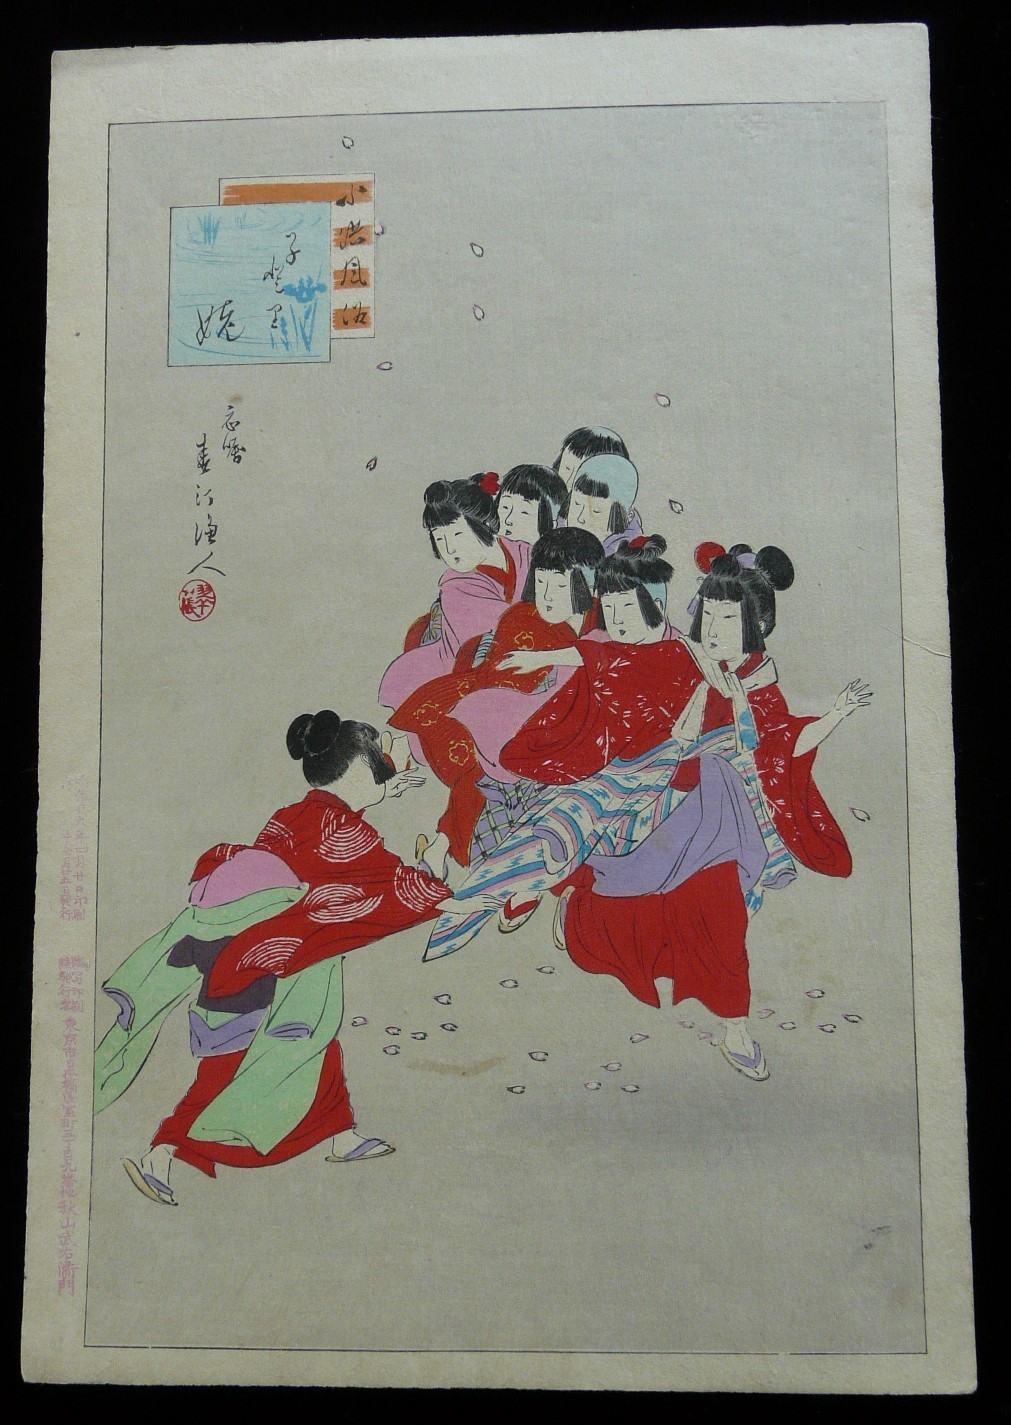 MIYAGAWA SHUNTEI: #P2299 FROM THE SERIES KODOMO FUZOKU - CHILDREN'S REFINEMENTS (1896)